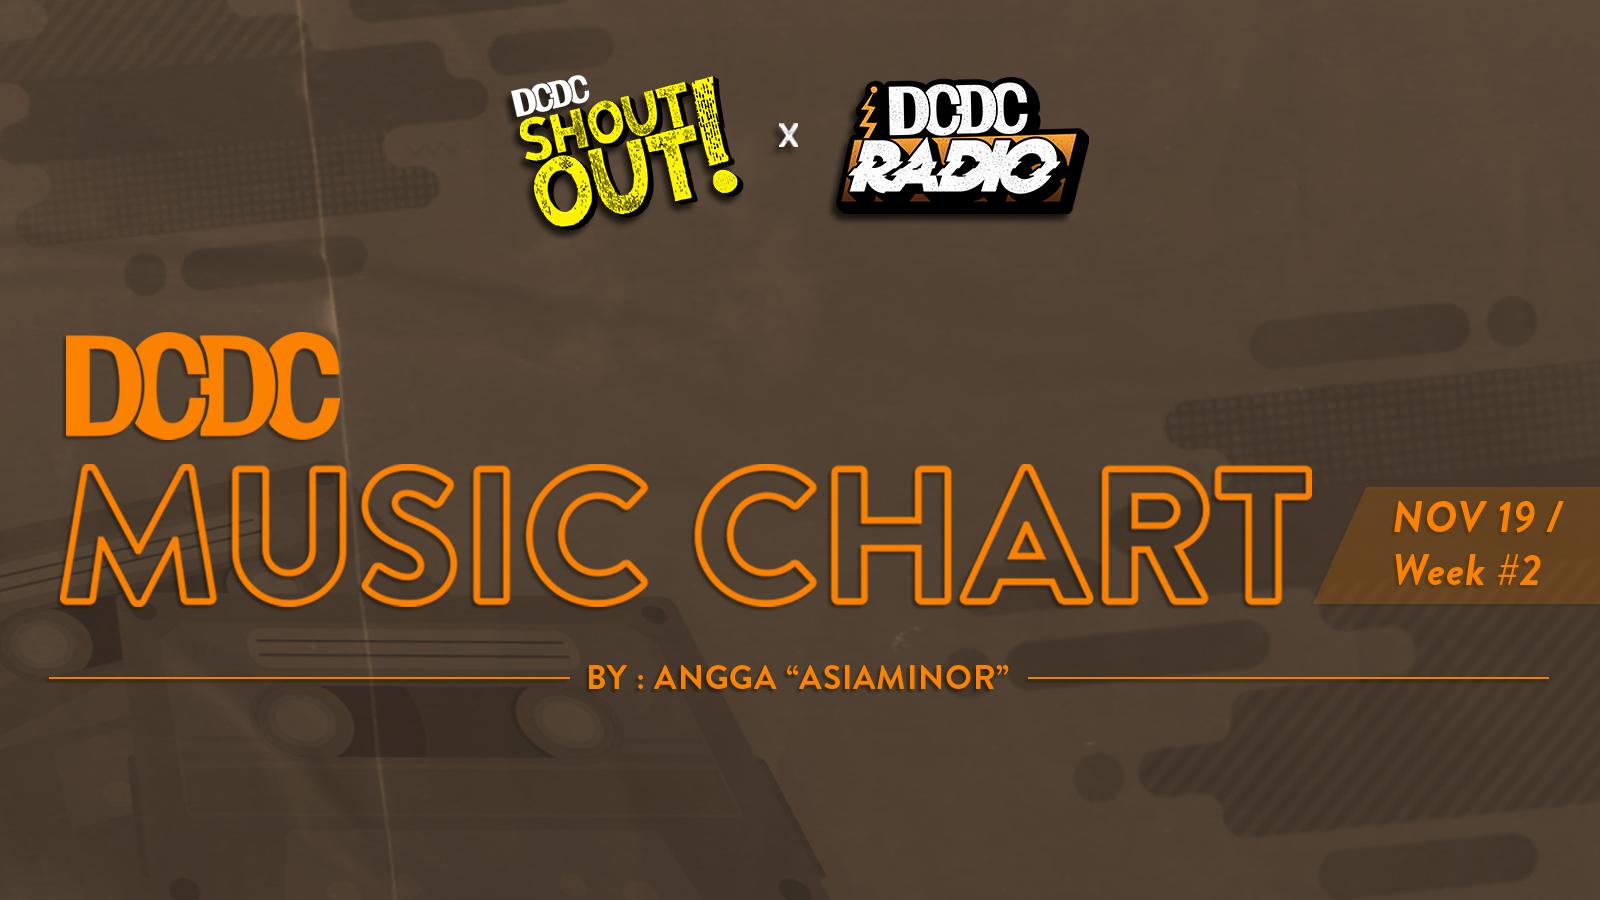 DCDC Music Chart - #2nd Week of November 2019